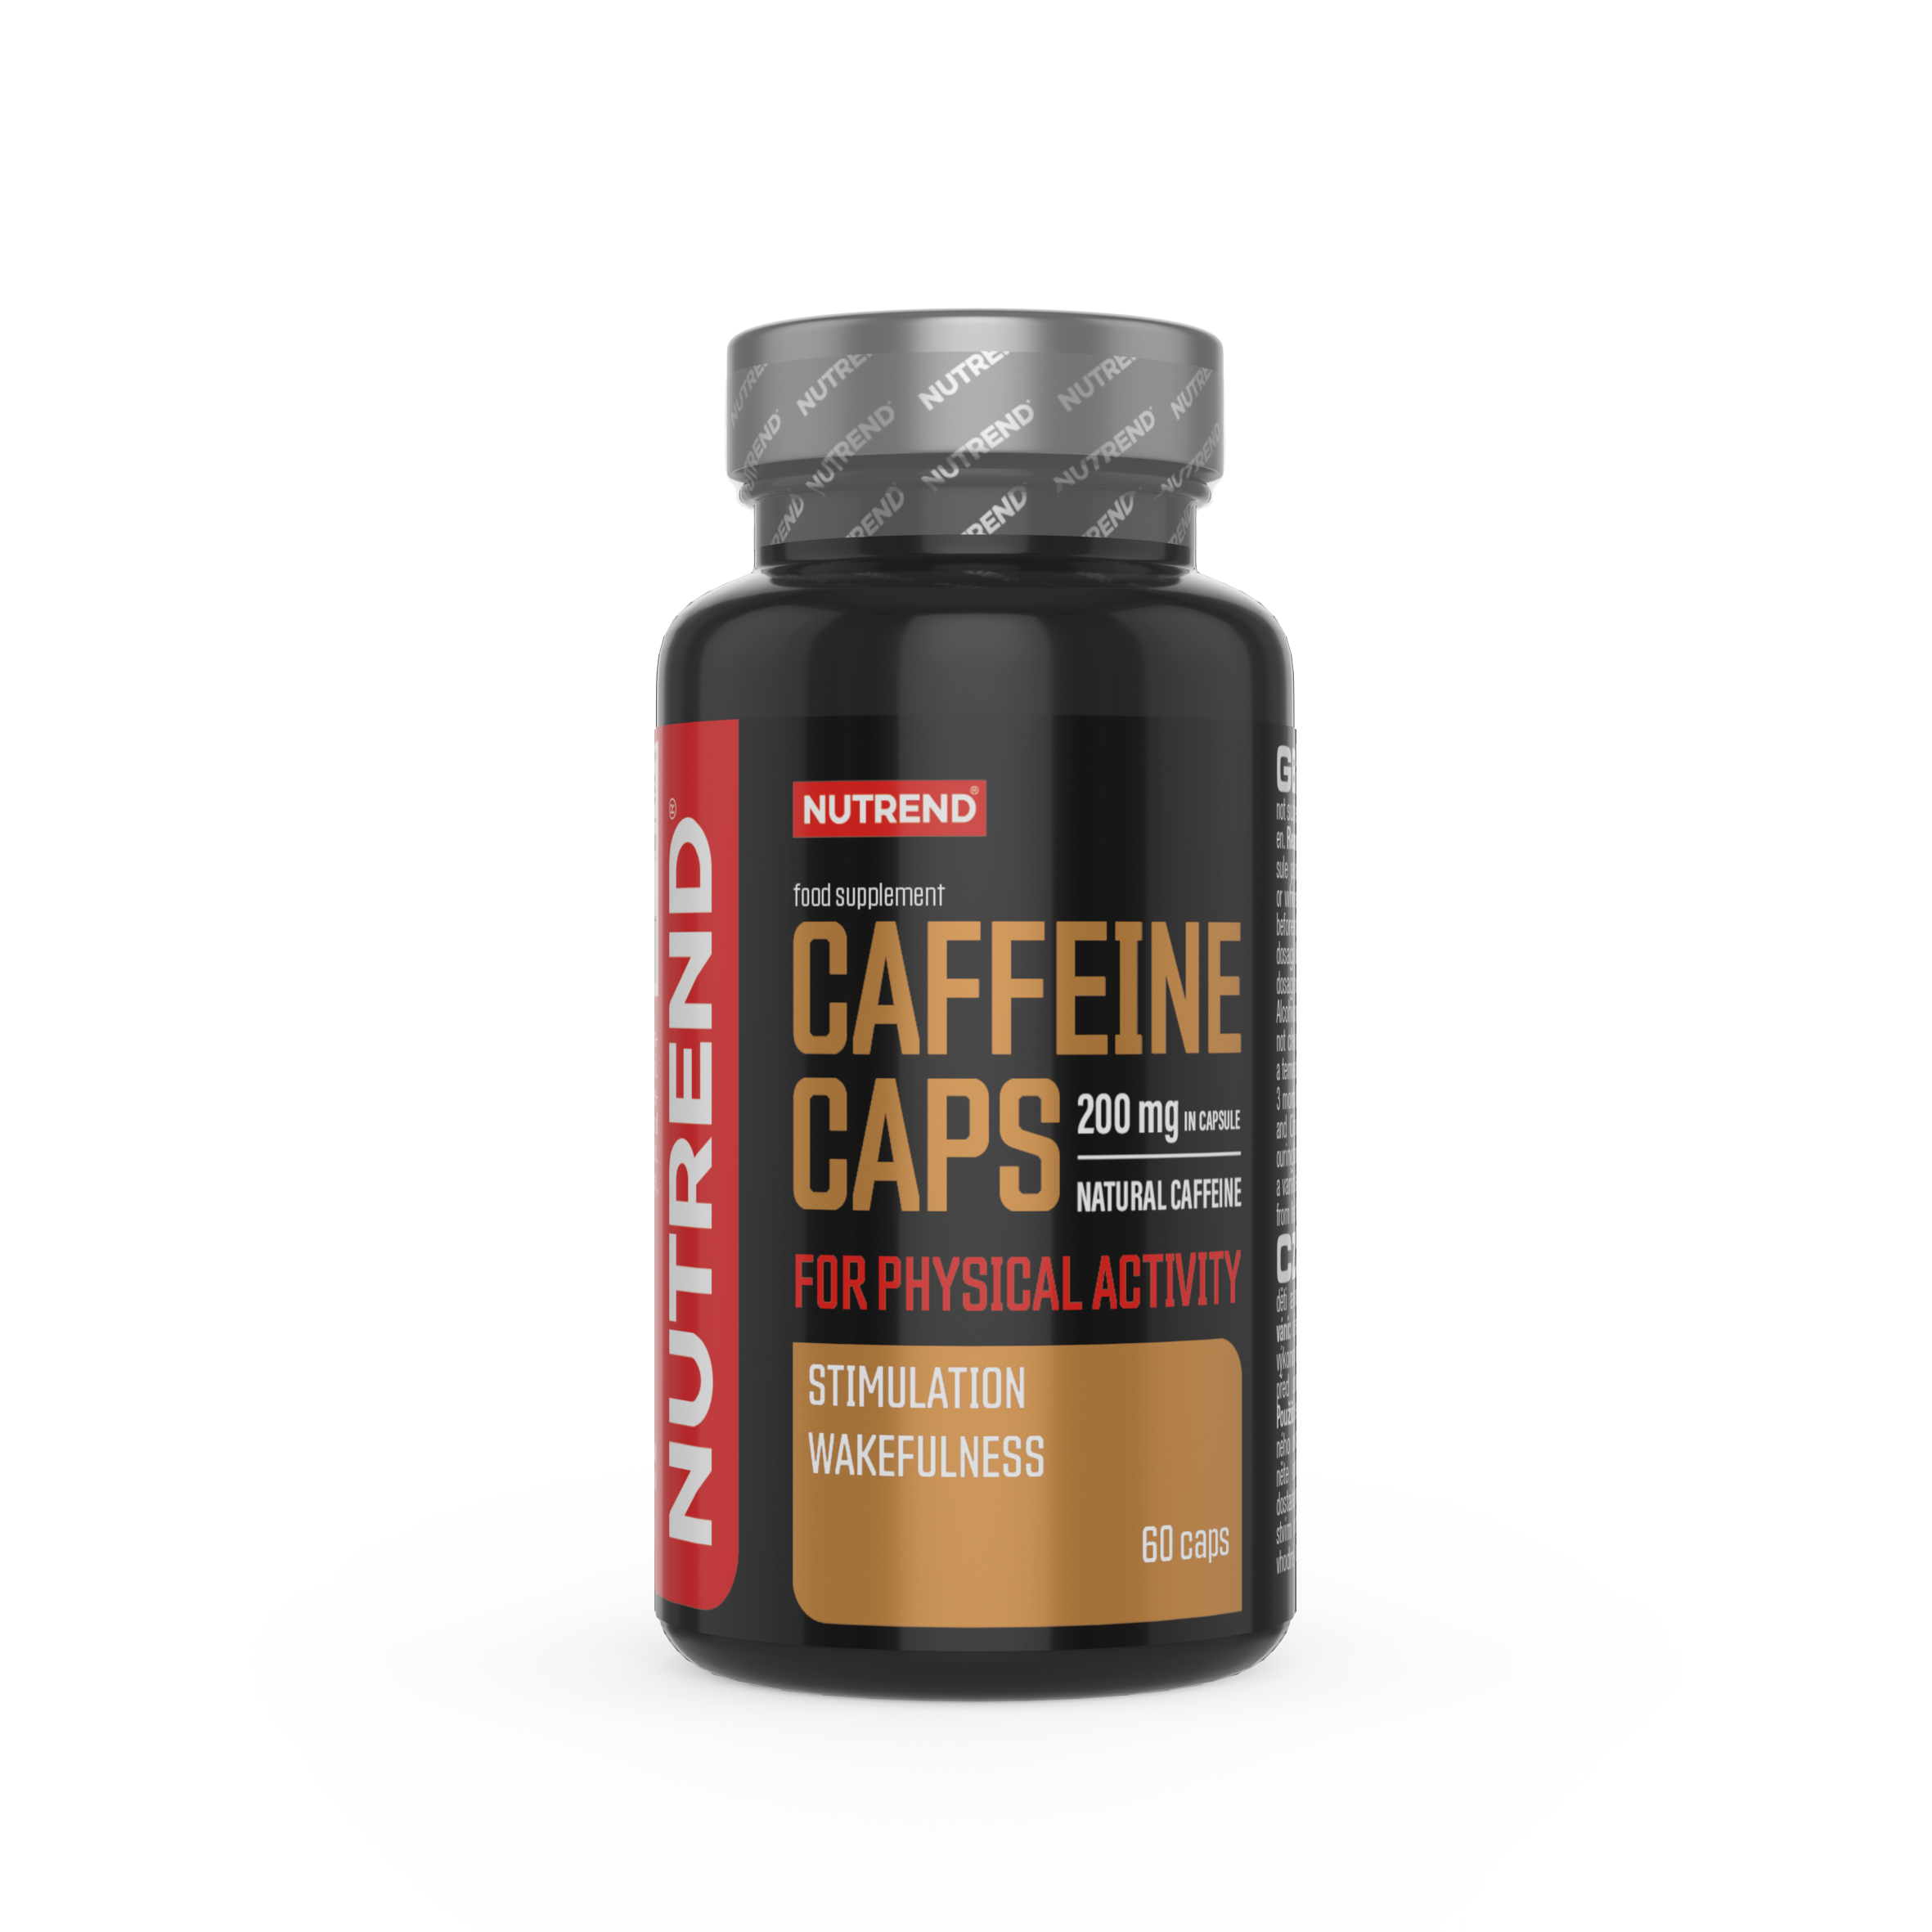 Nutrend-Coffein-Caps